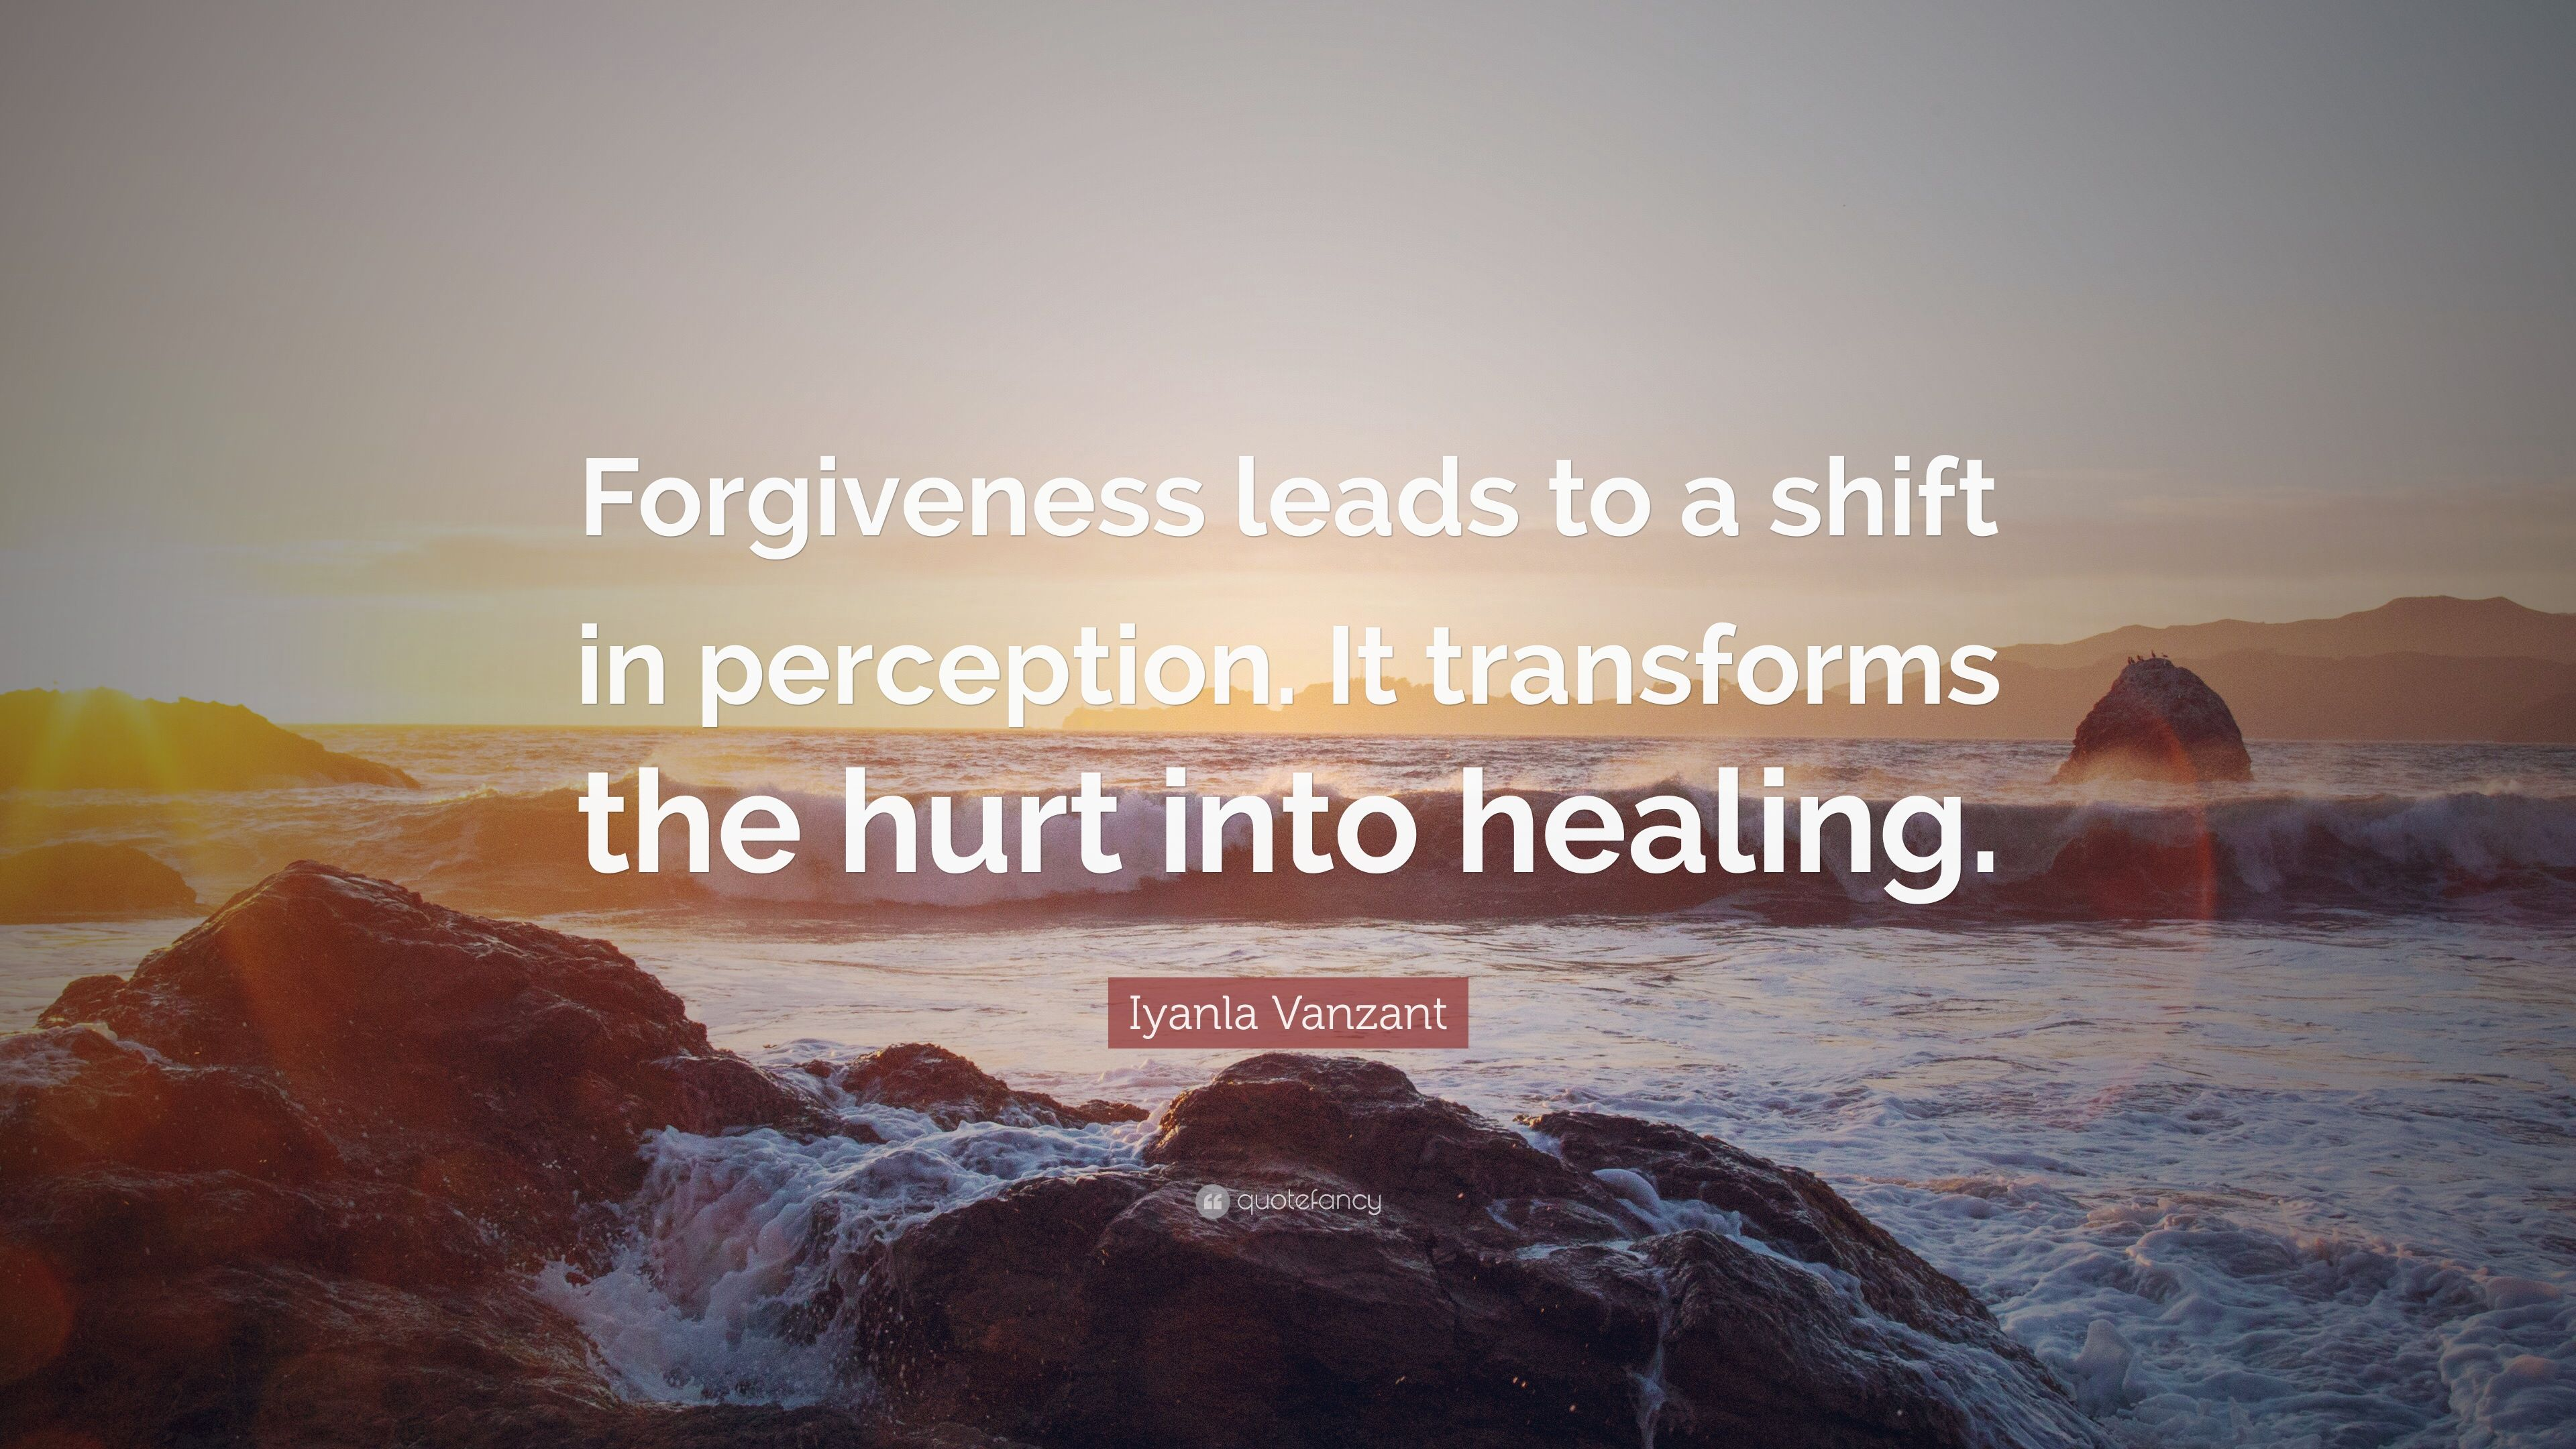 Iyanla Vanzant Quotes On Forgiveness